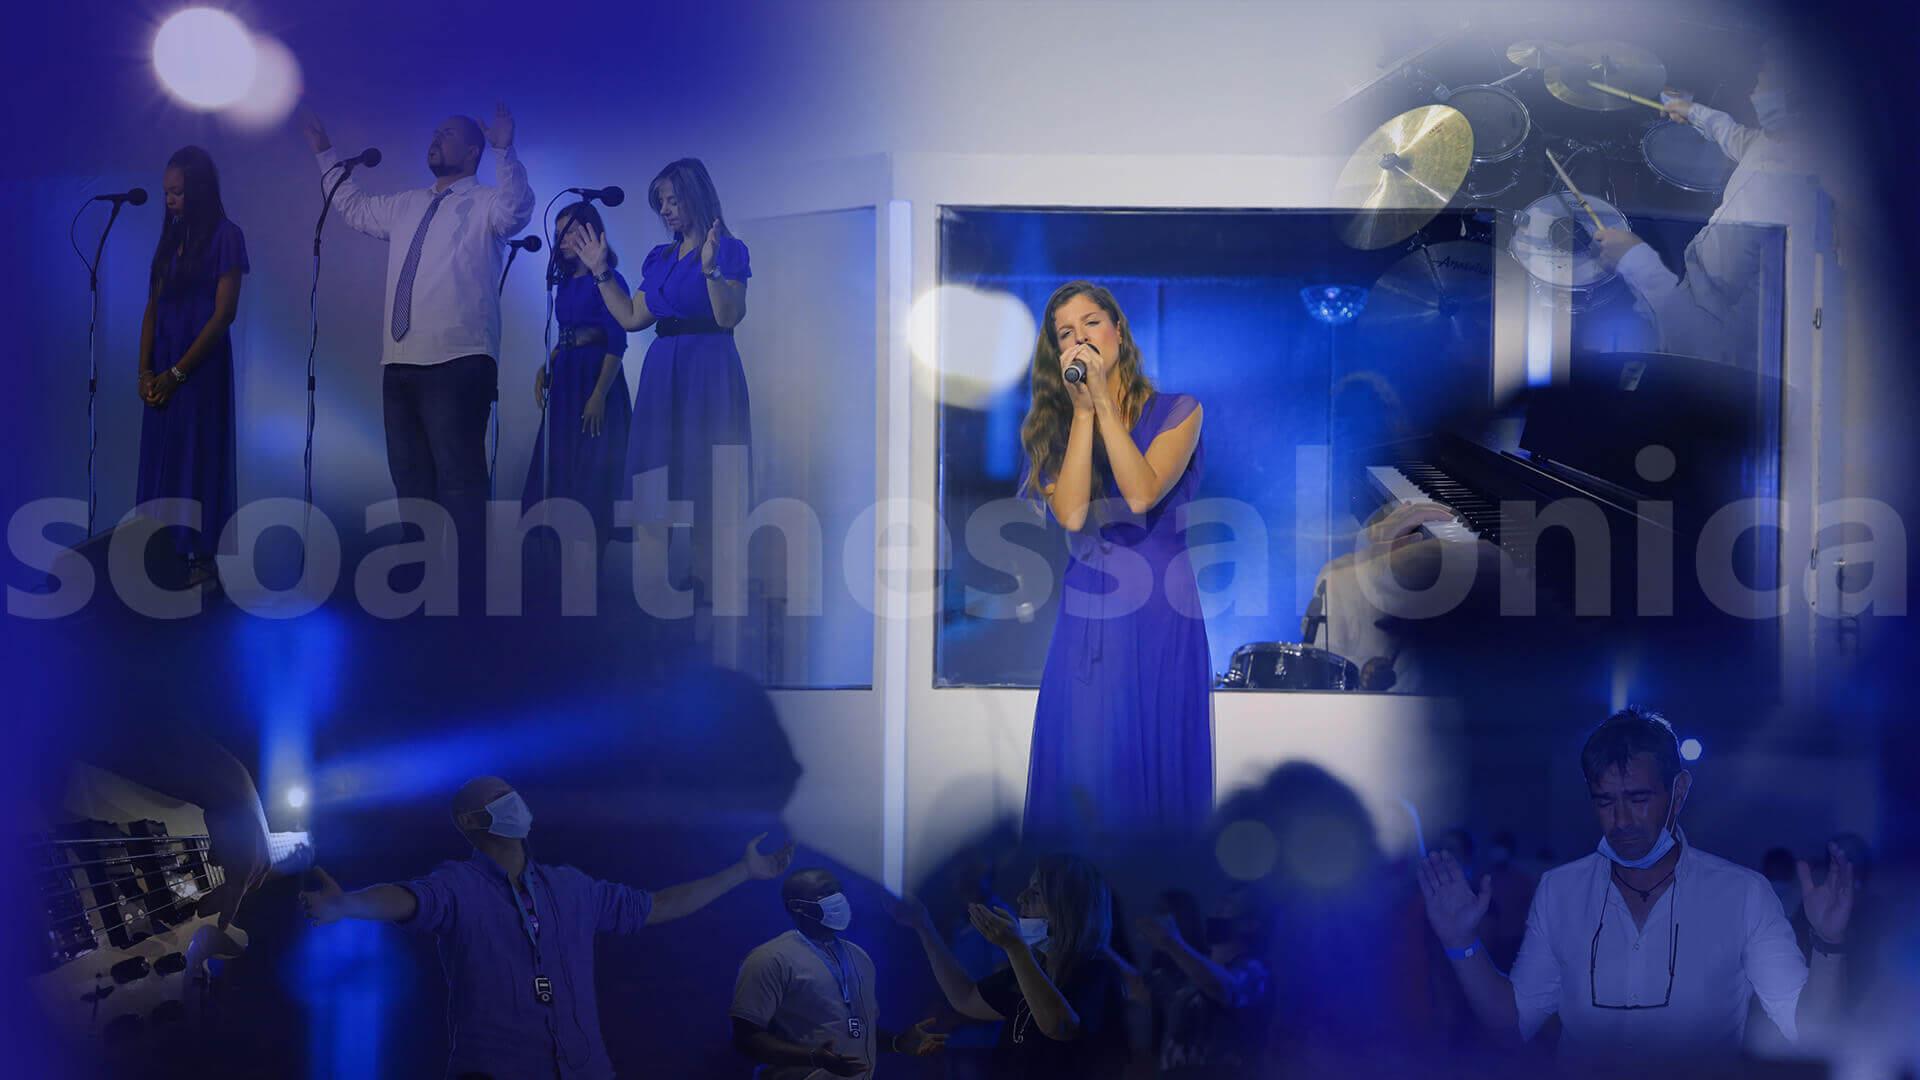 SCOAN_THESSALONICA_WORSHIP_2020_08_02